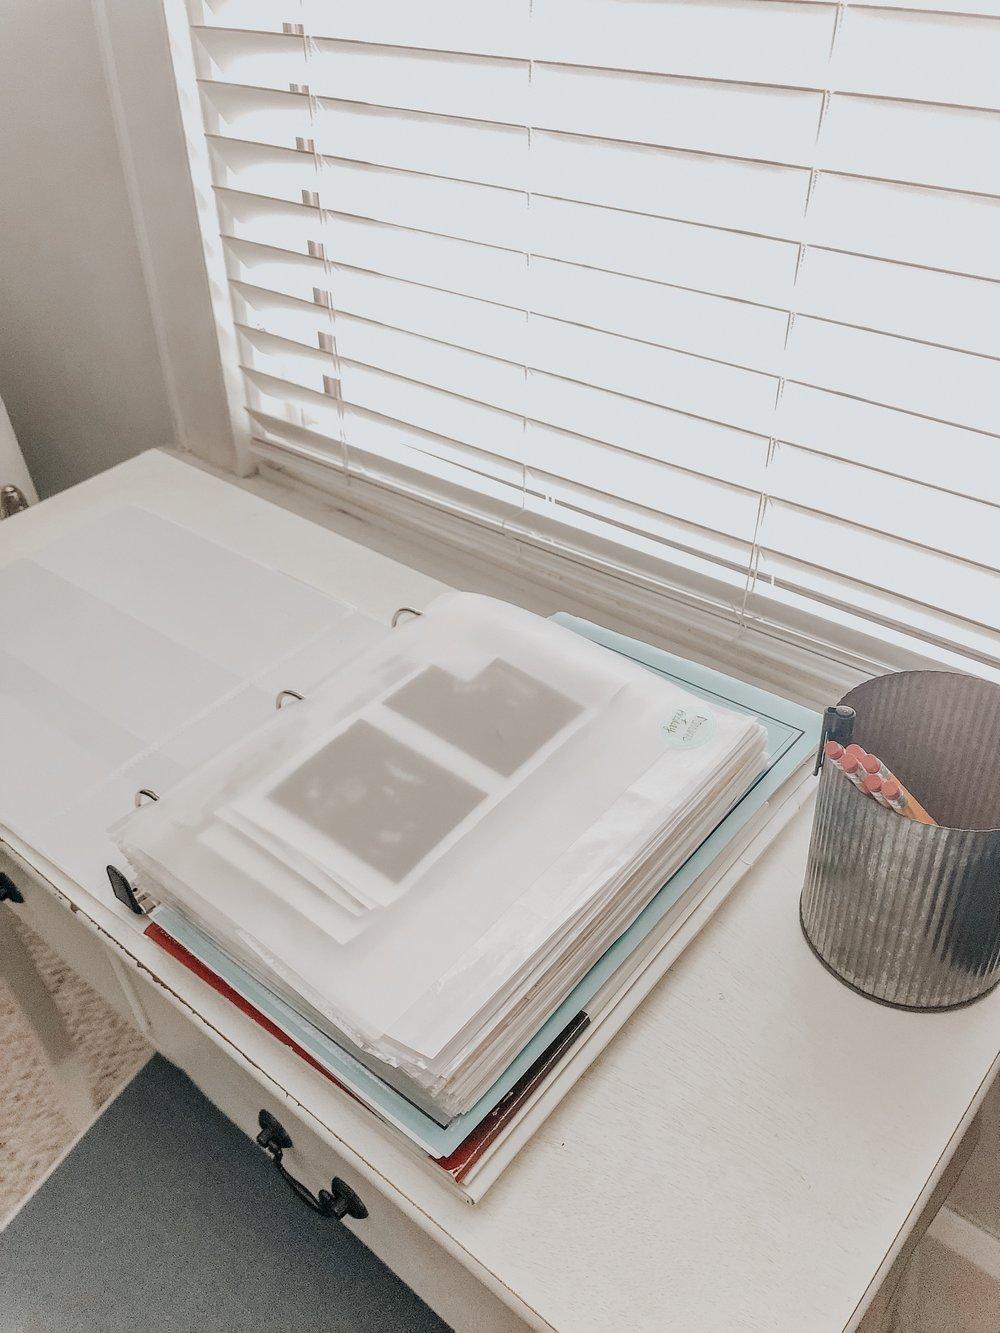 Paperwork organized in the binder